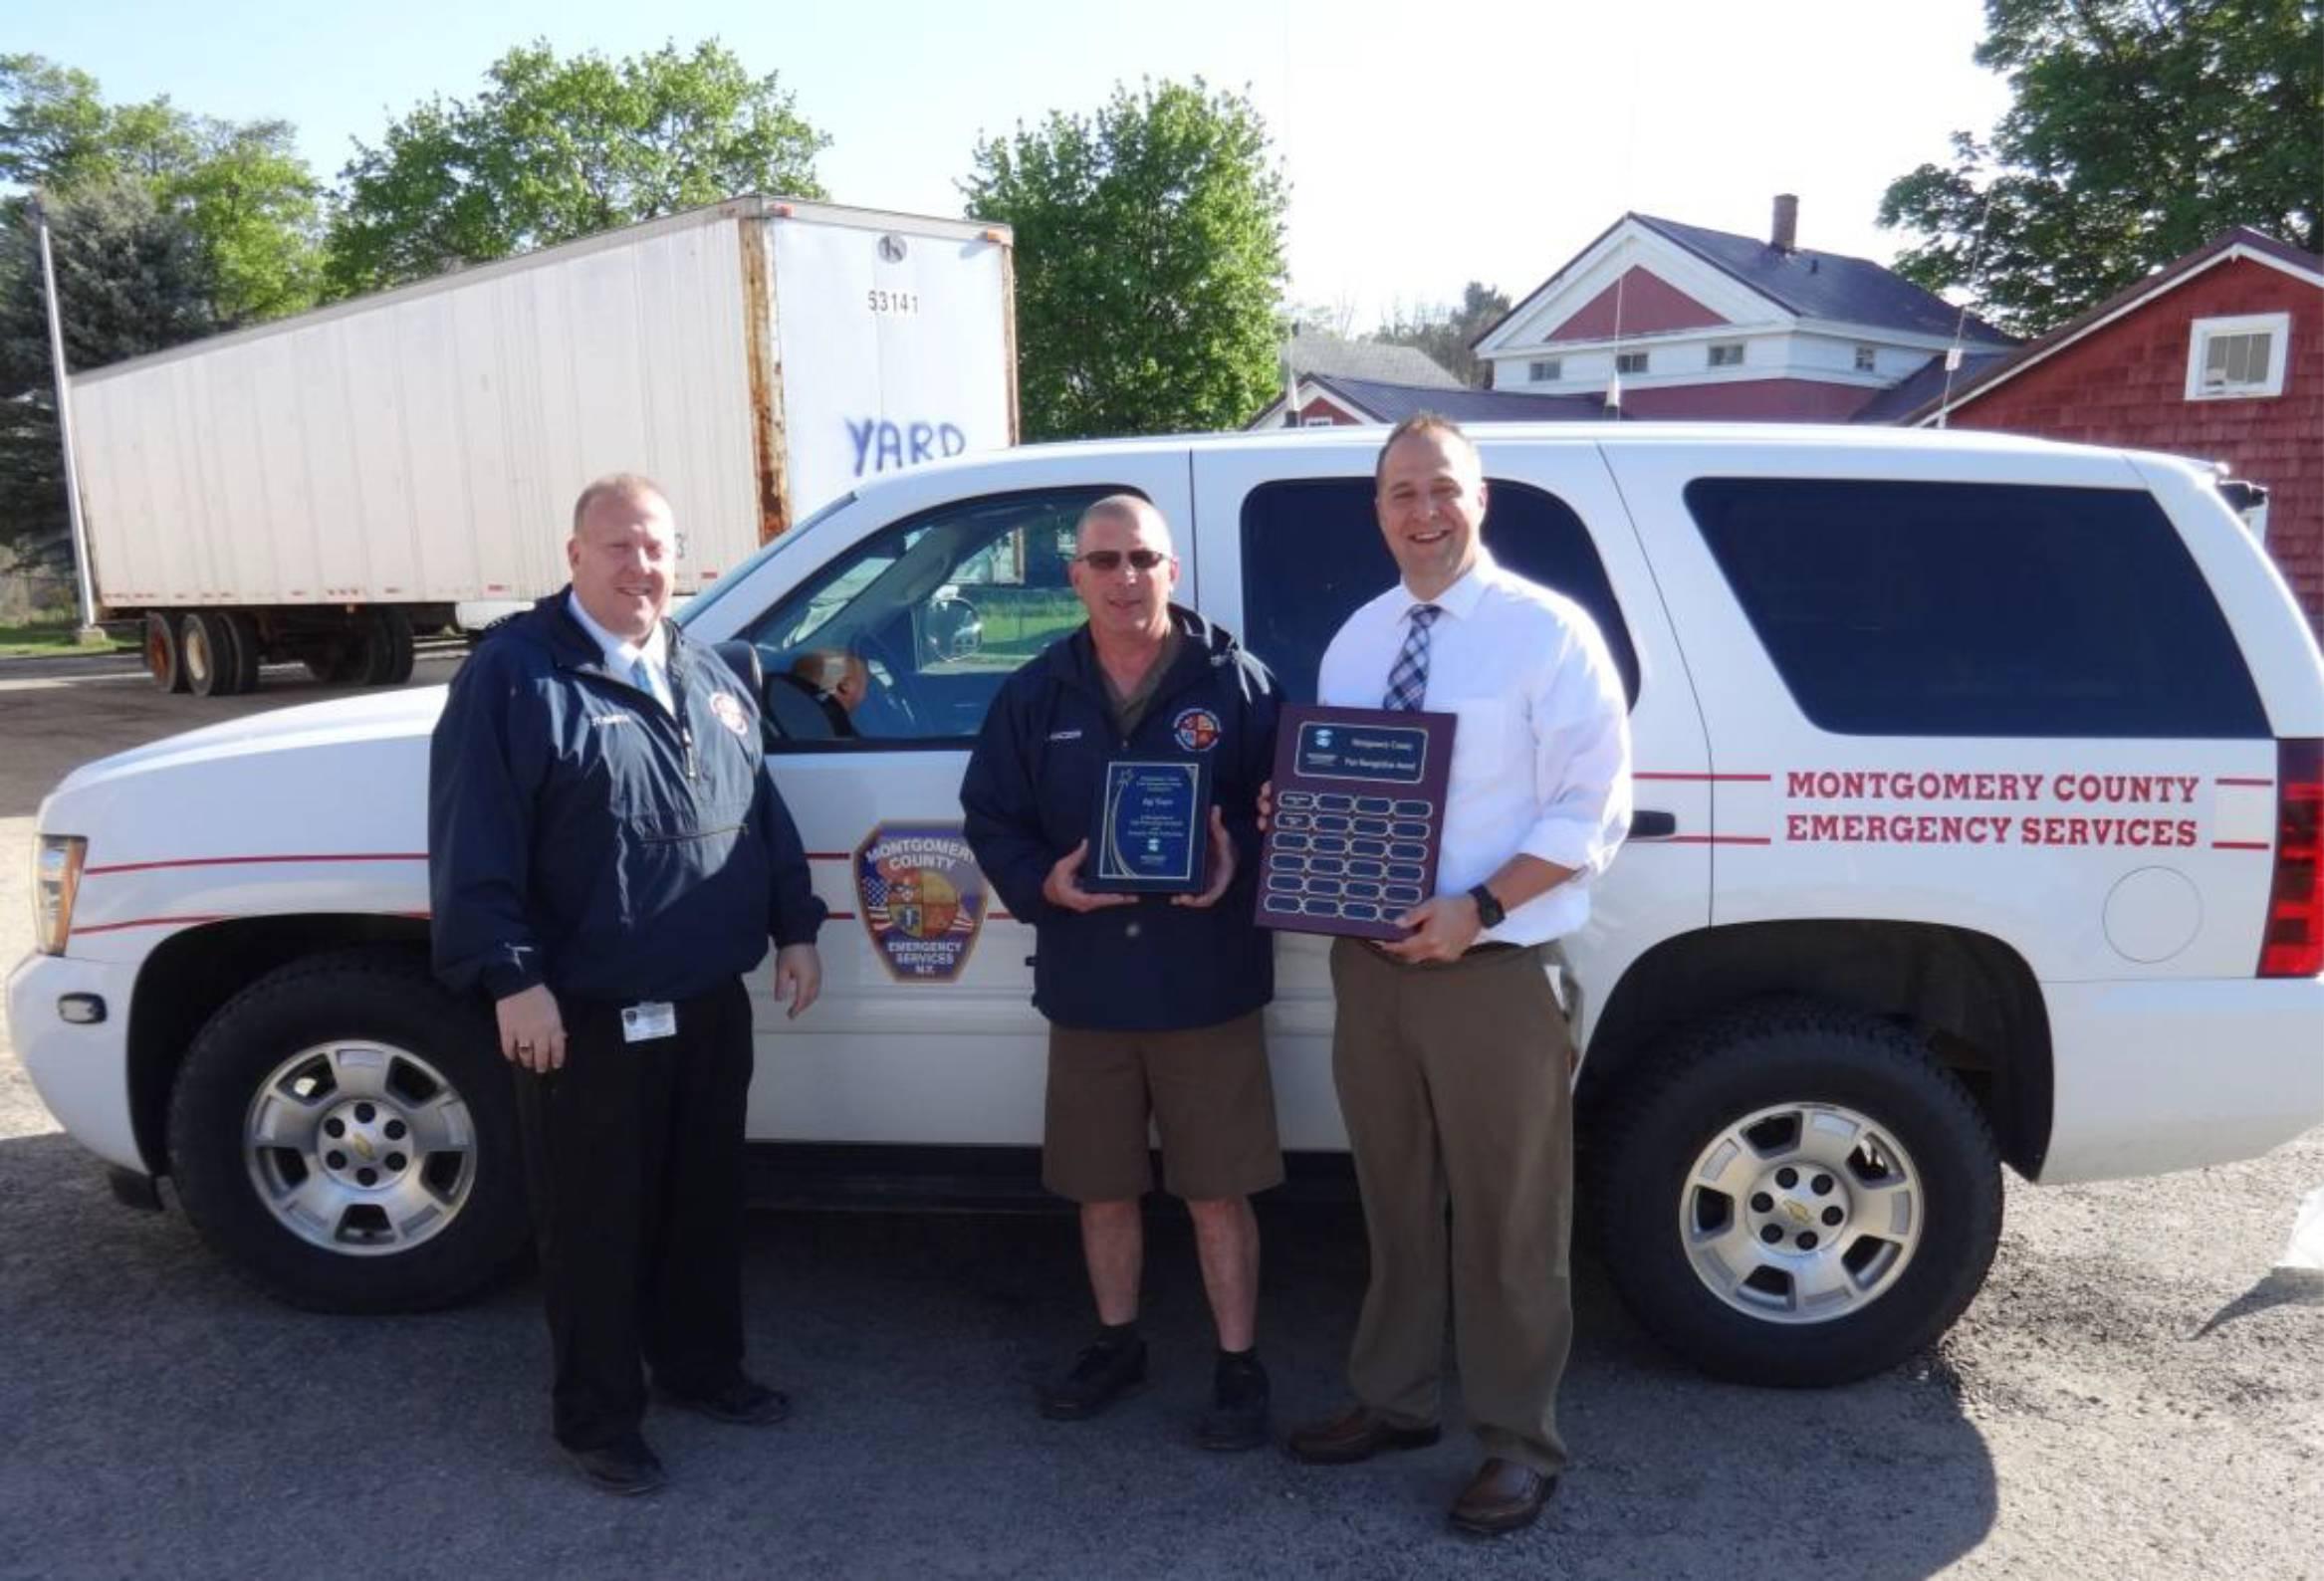 County Executive Matthew L. Ossenfort presents Jeff Kaczor the Montgomery County Peer Recognition Award.